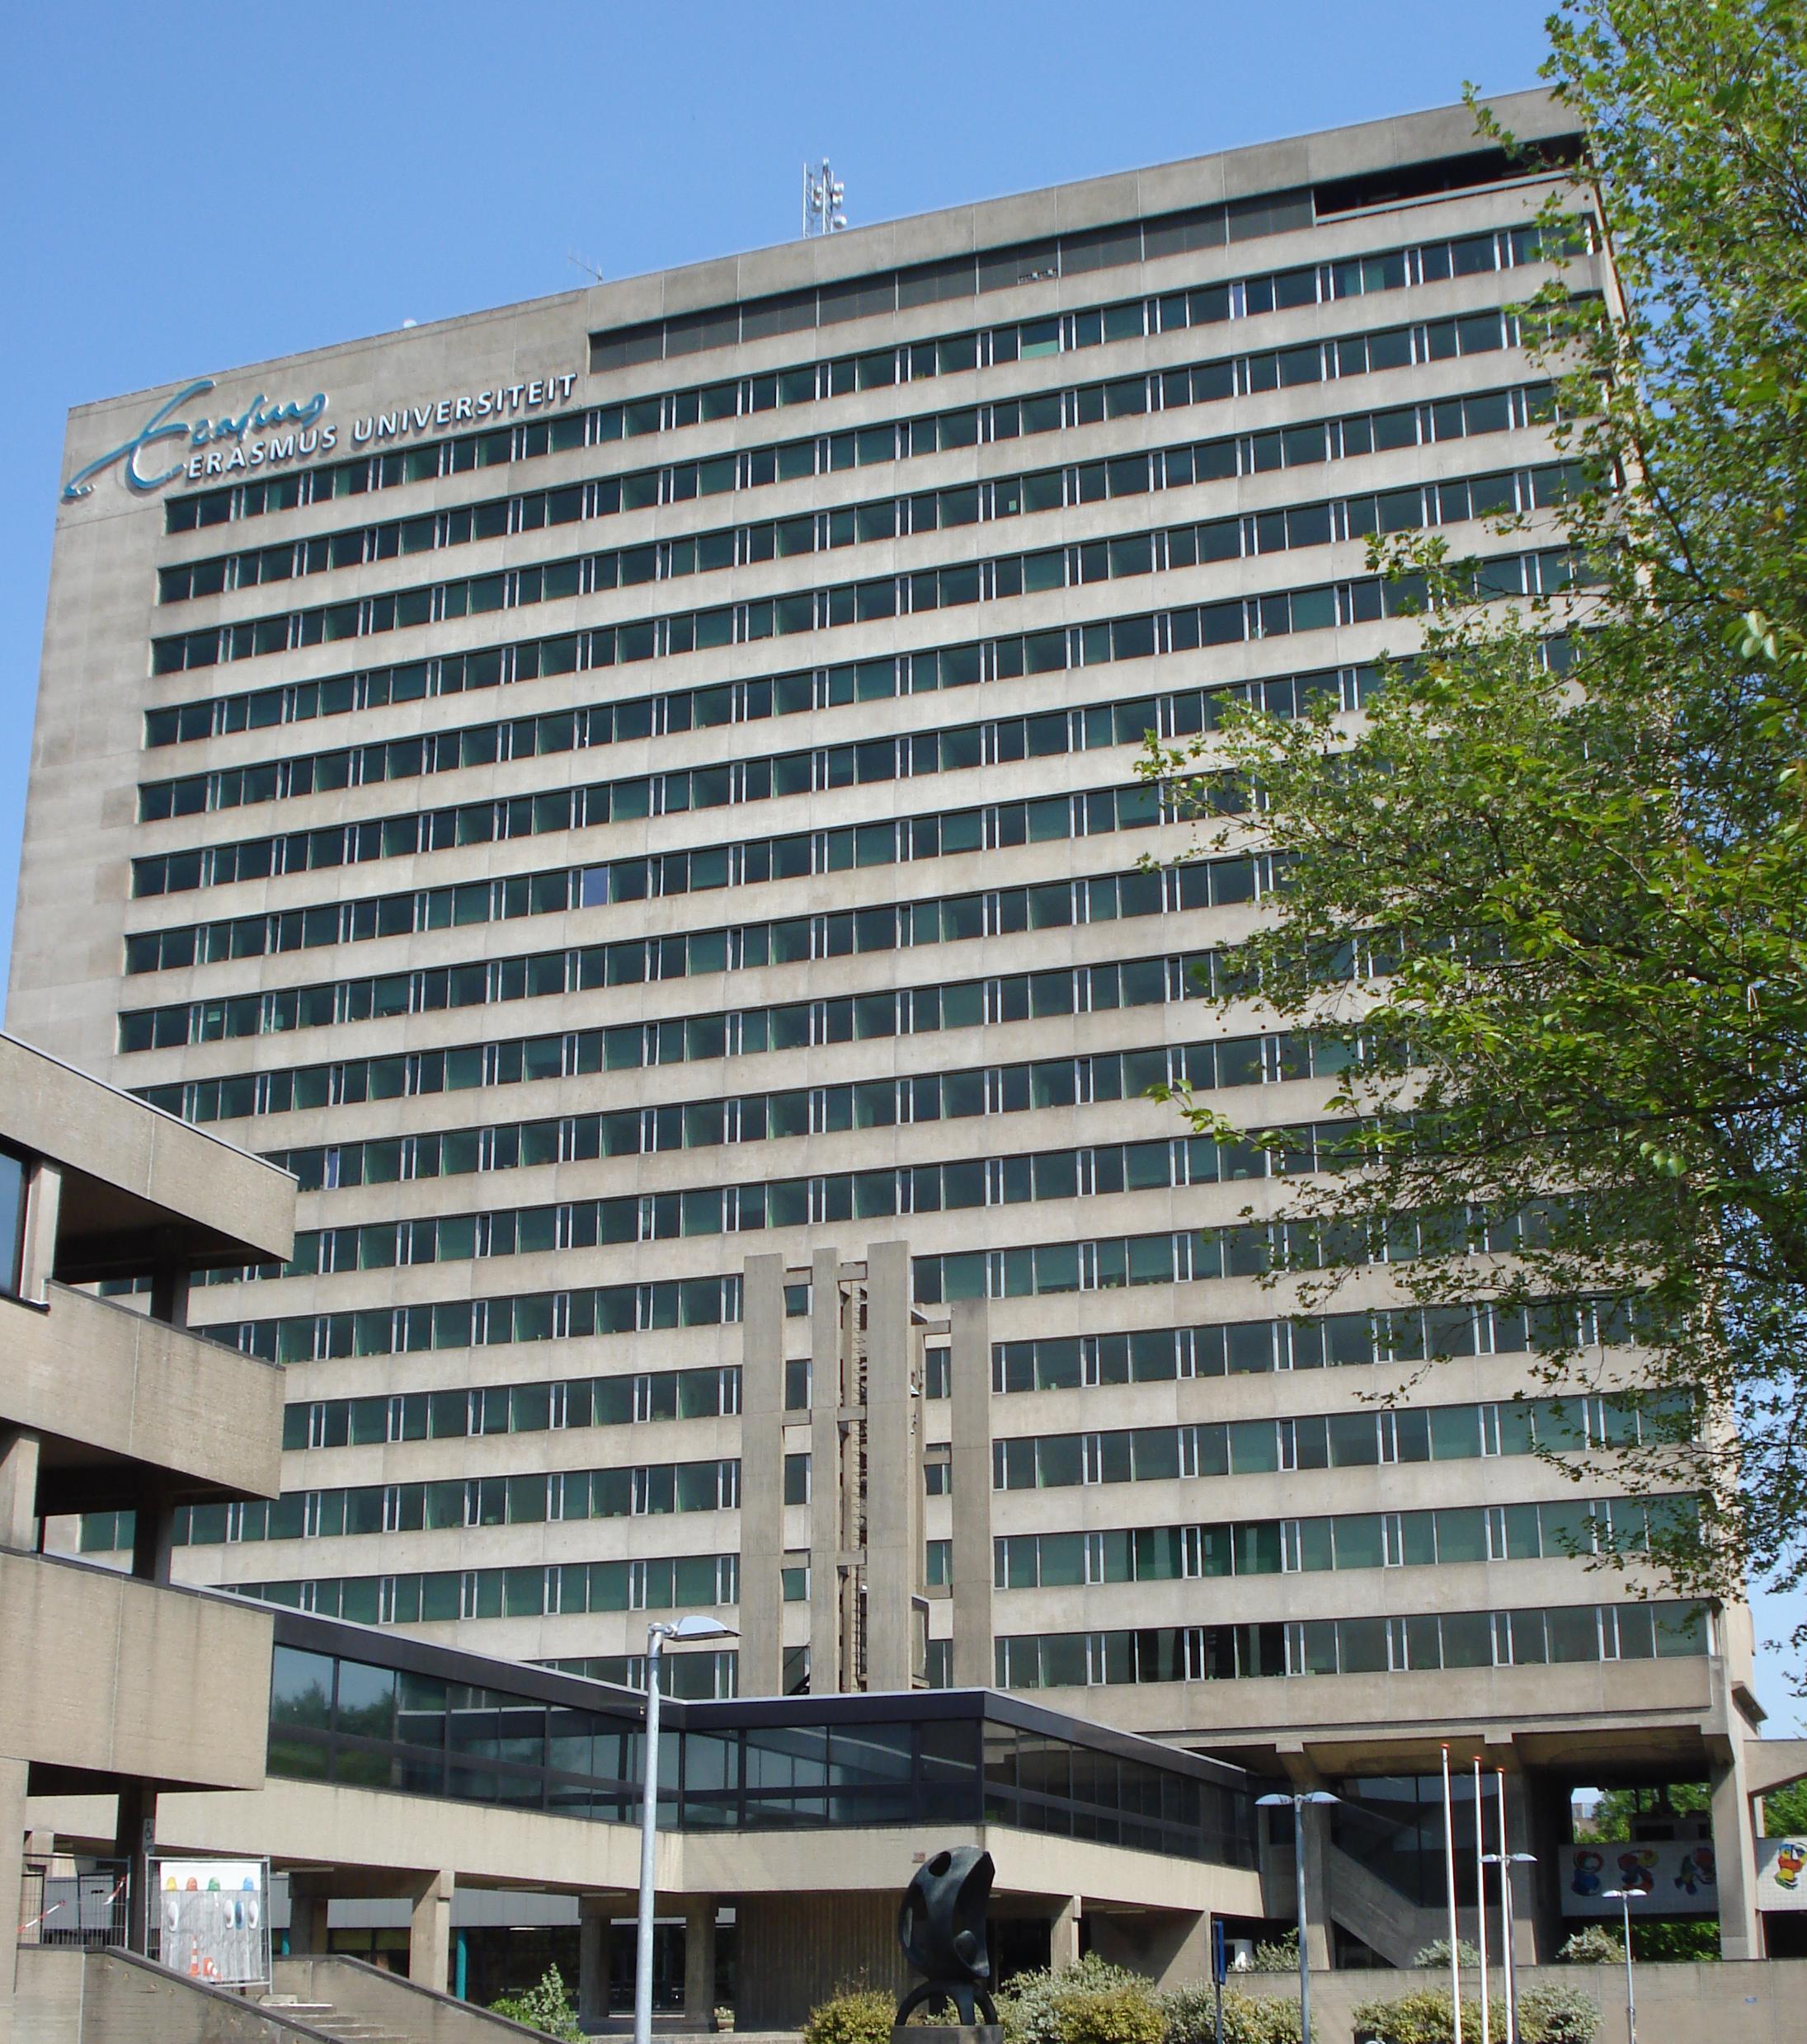 Beschrijving rotterdam universiteit faculteitsgebouw